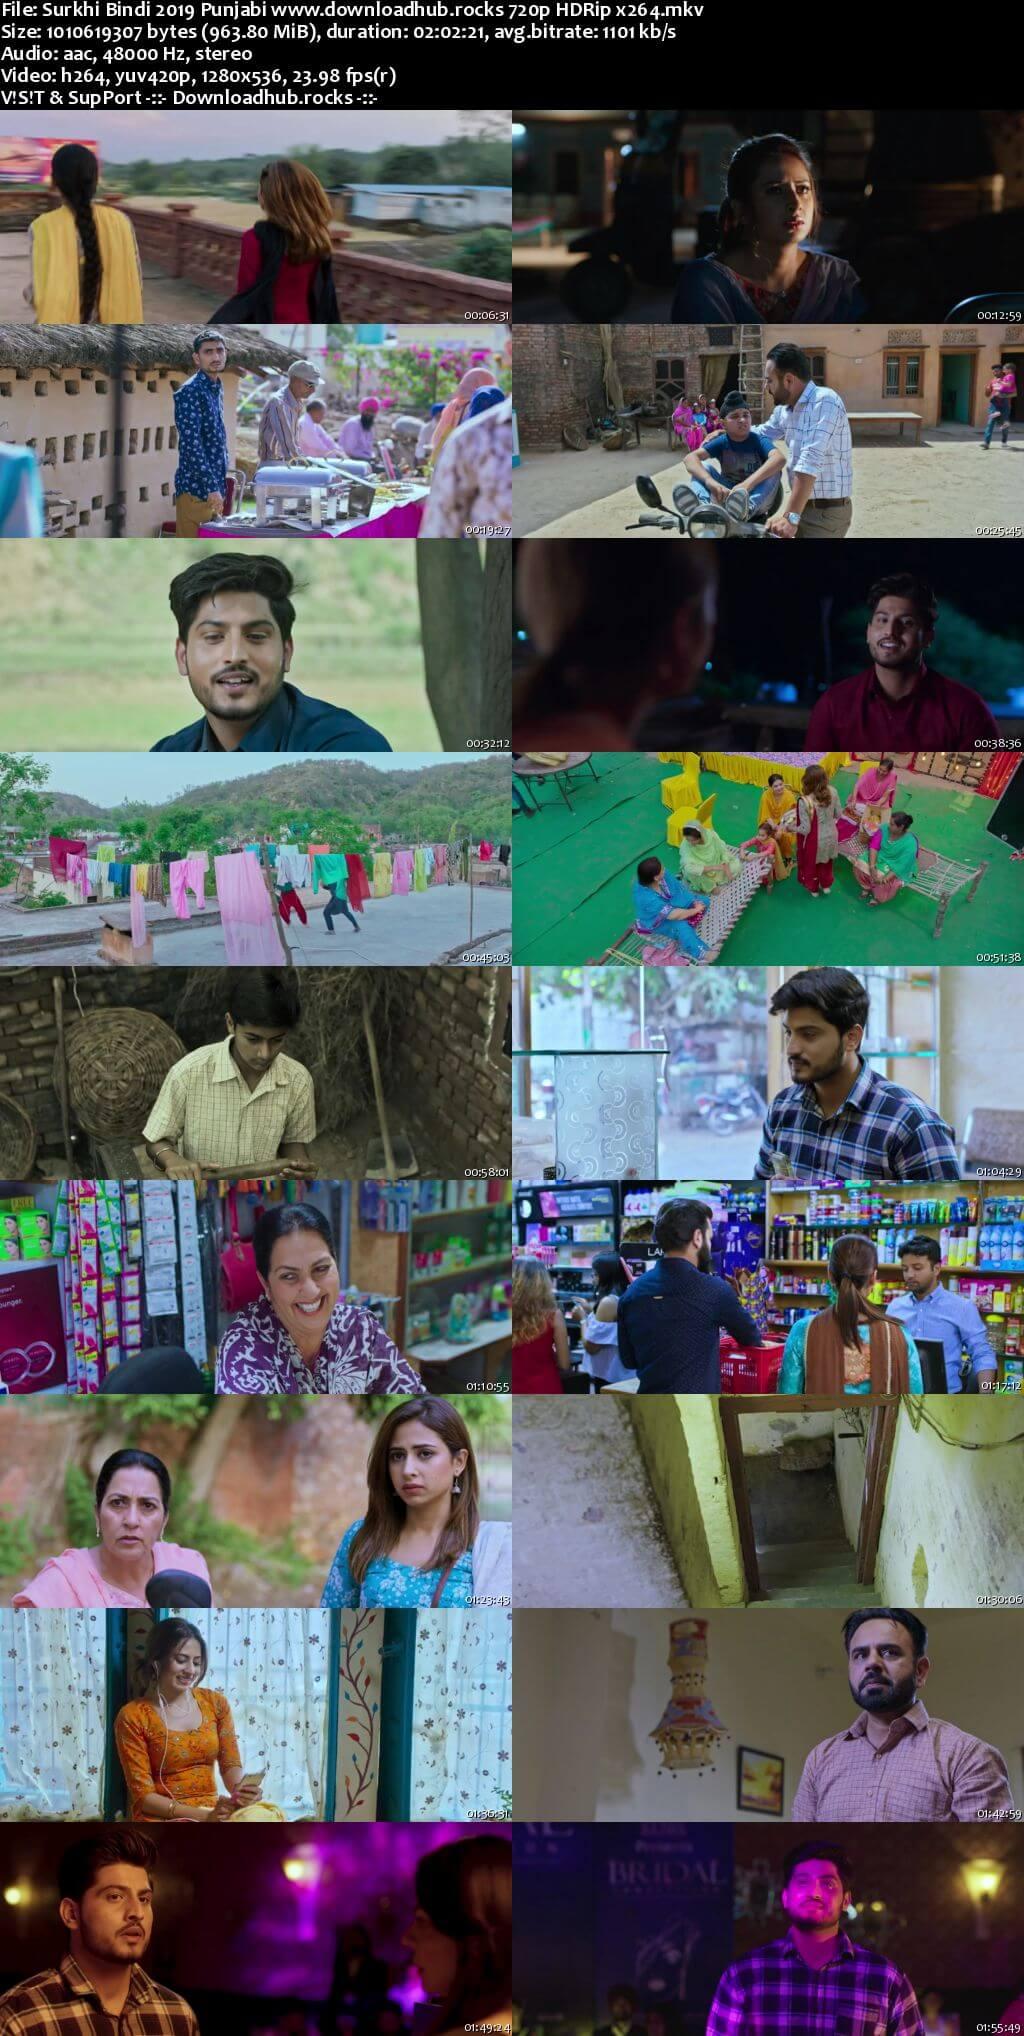 Surkhi Bindi 2019 Punjabi 720p HDRip x264